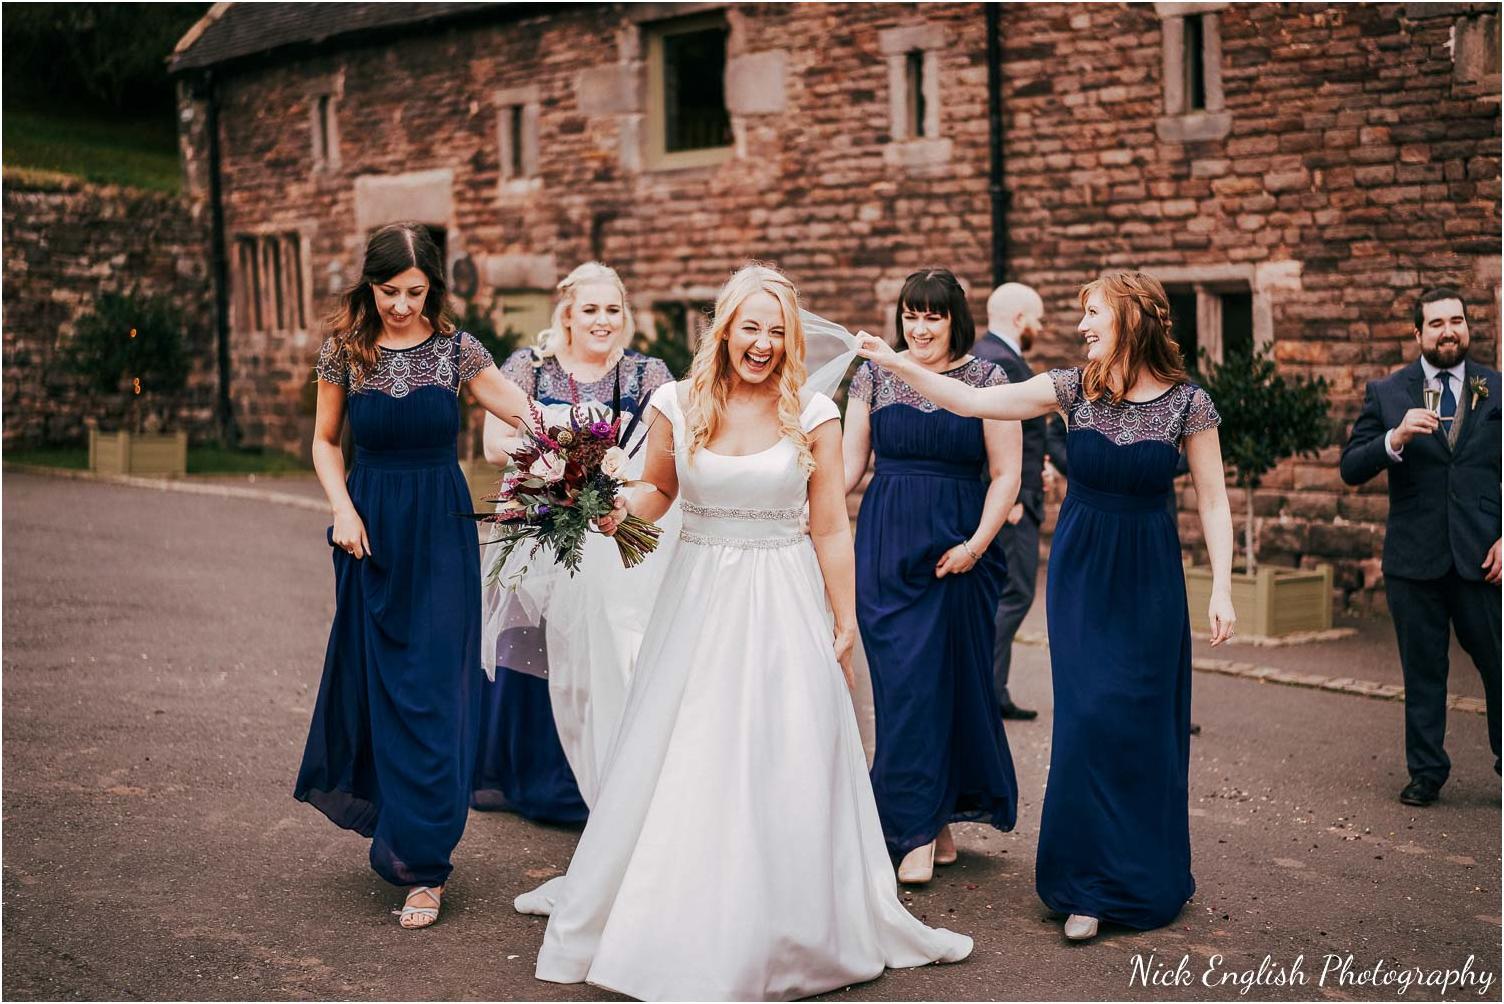 The_Ashes_Barn_Endon_Stoke_Wedding_Photographer-59.jpg